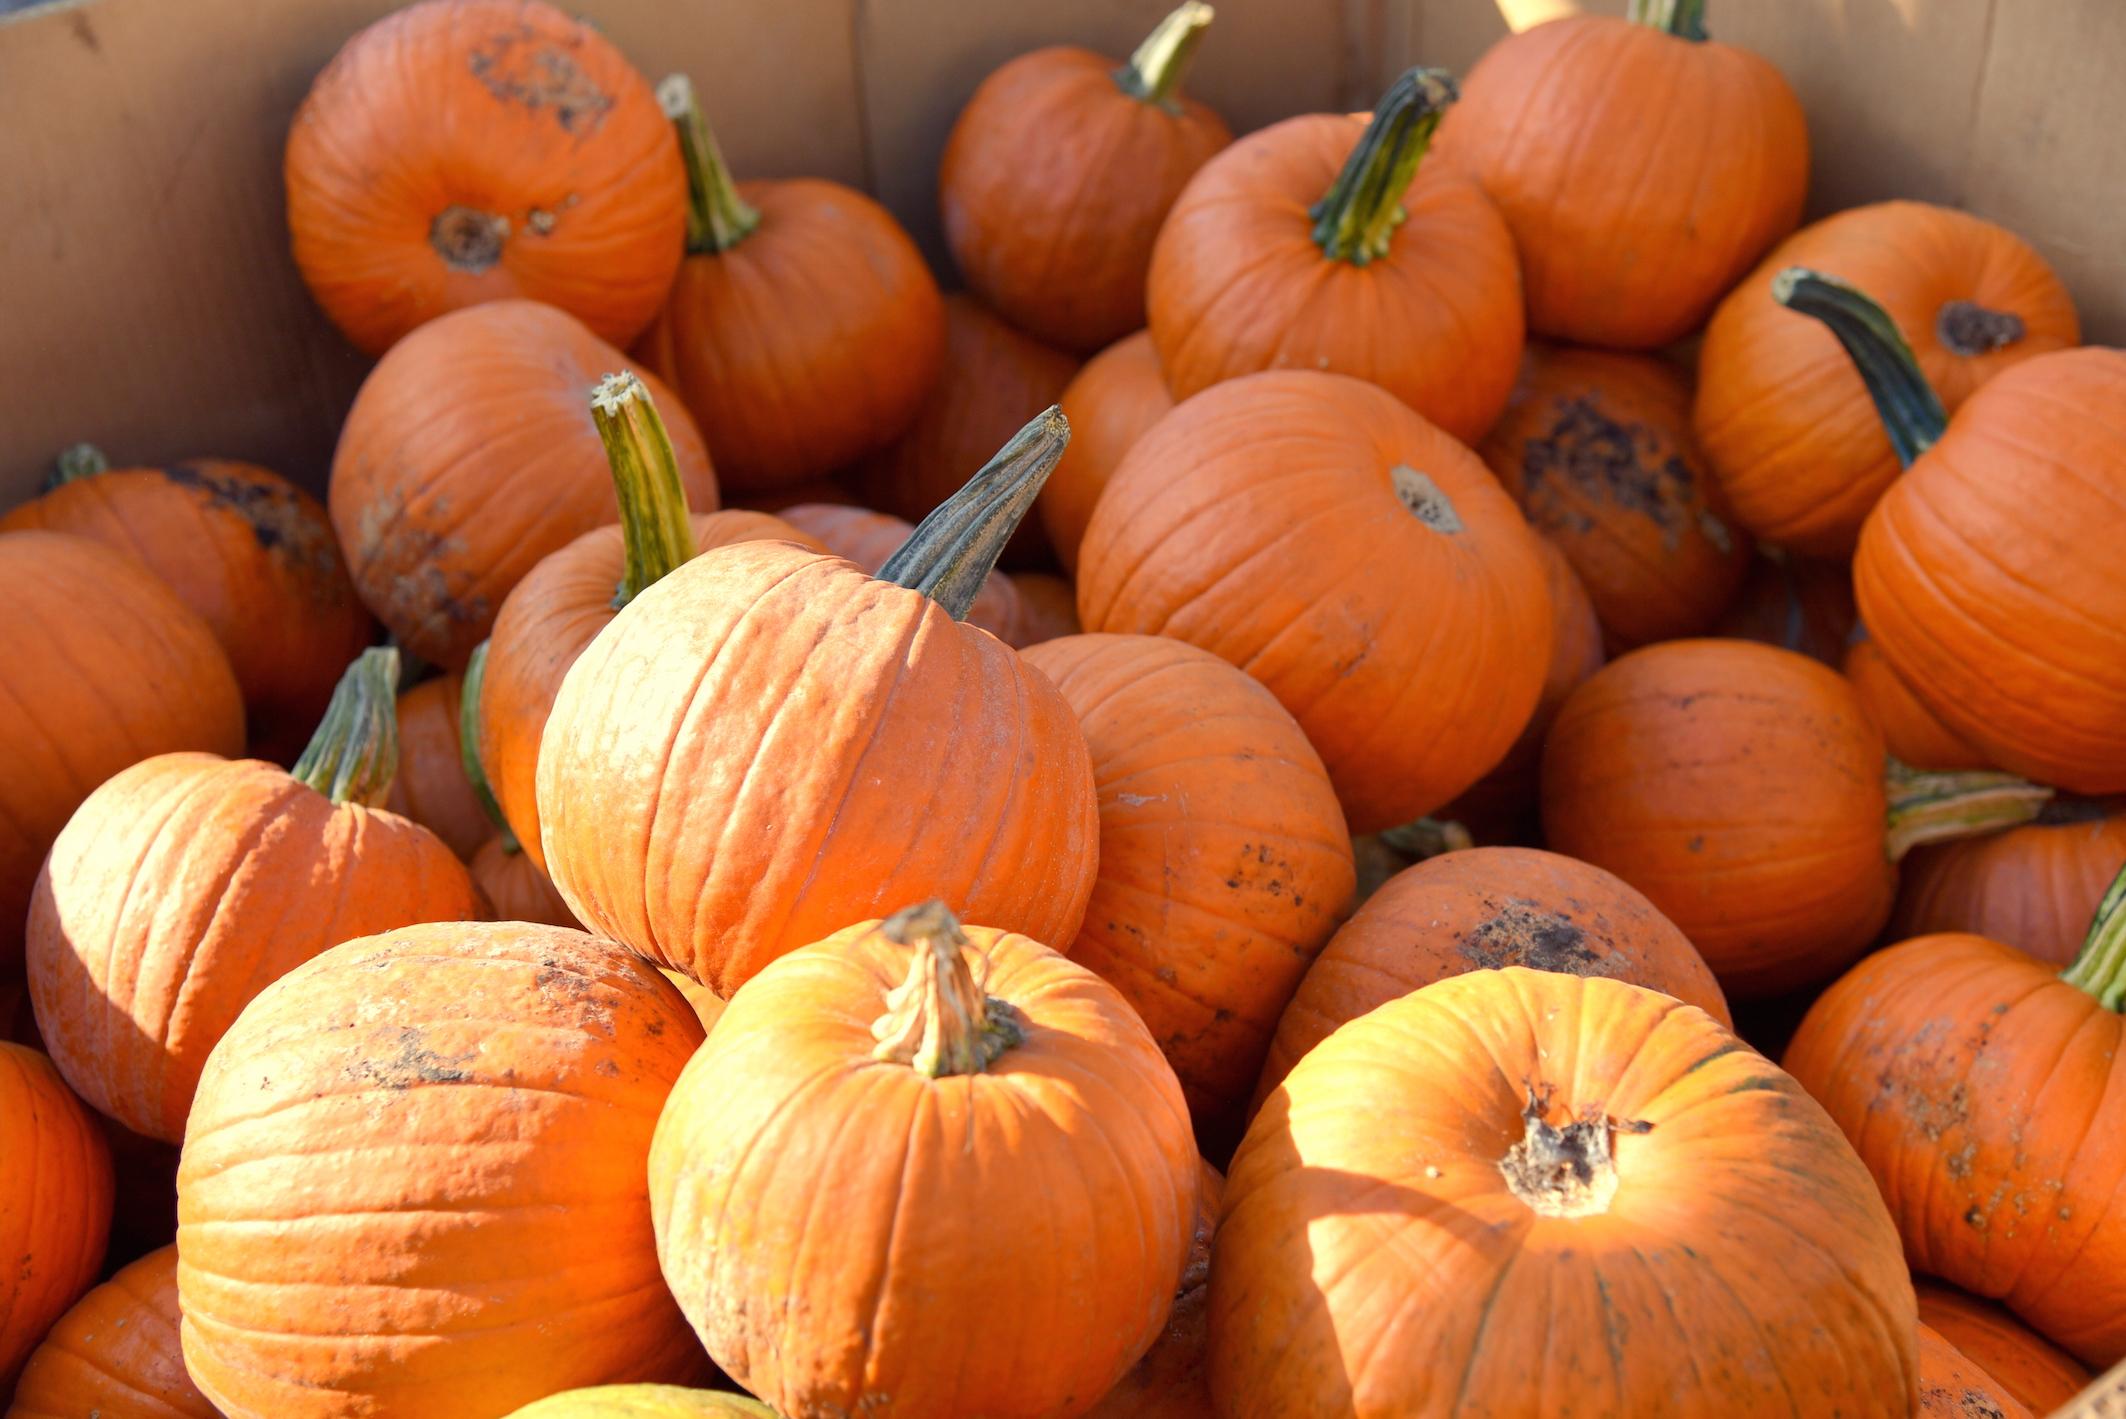 Pumpkin picking in New York Fall 2016